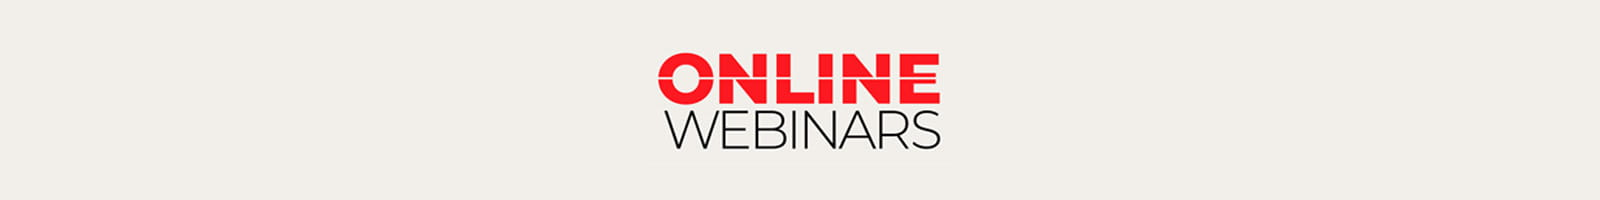 Online webinar header